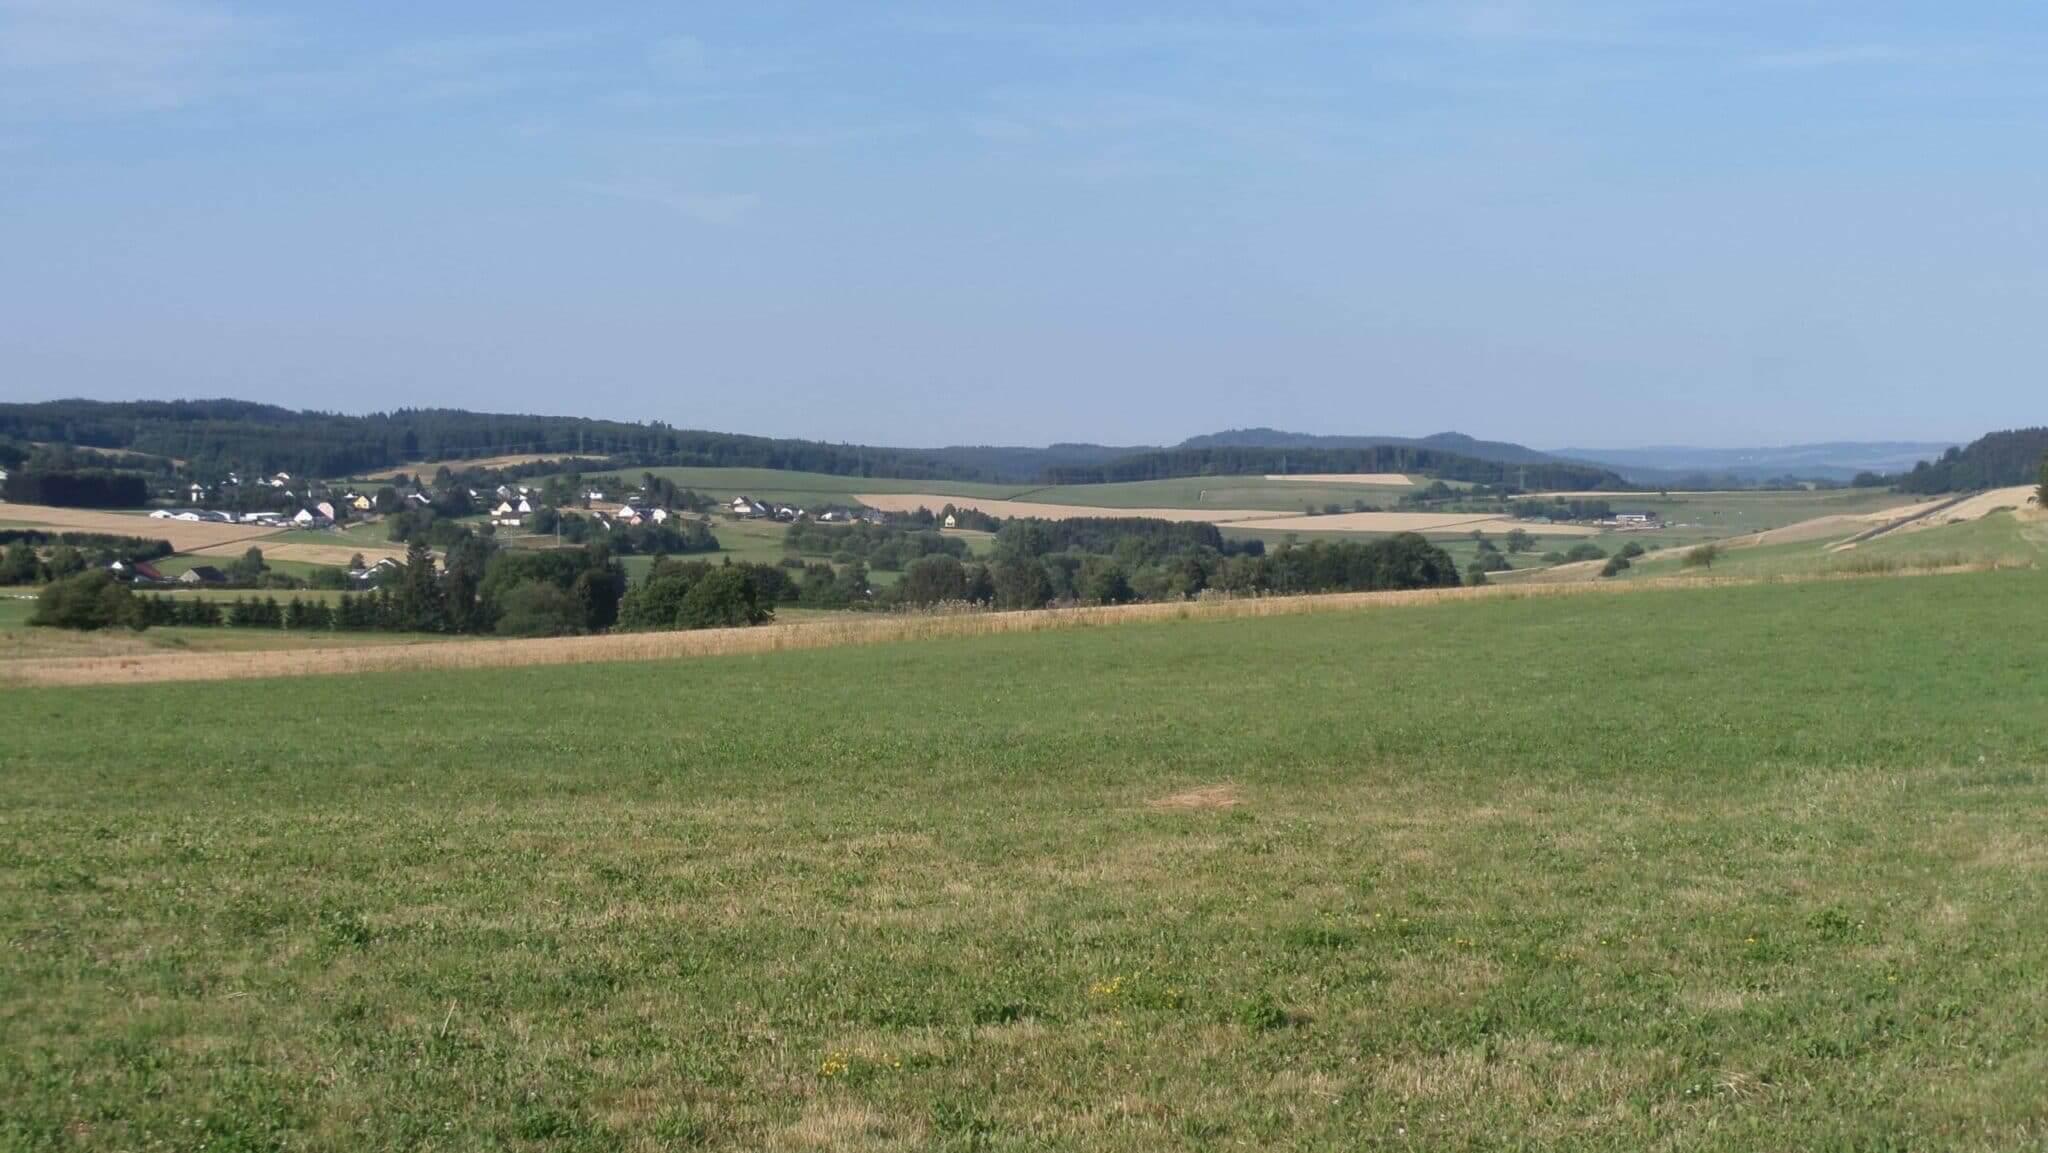 Paysage du voyage à vélo Alsace-Liège